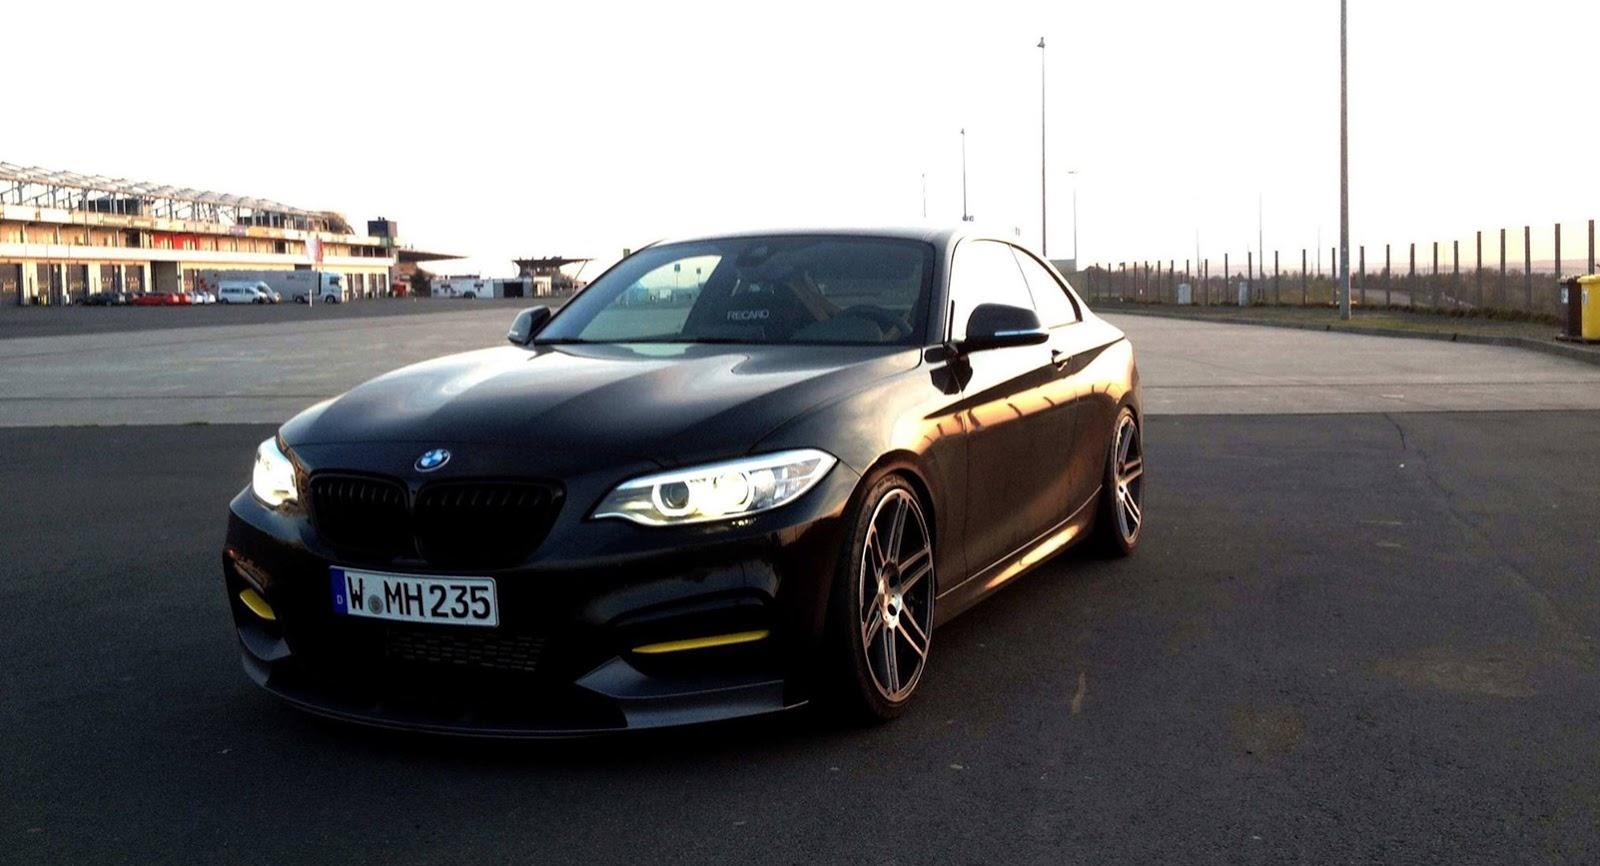 BMW Convertible bmw m235i race car Manhart Racing Teases 400hp+ BMW M235i - GTspirit